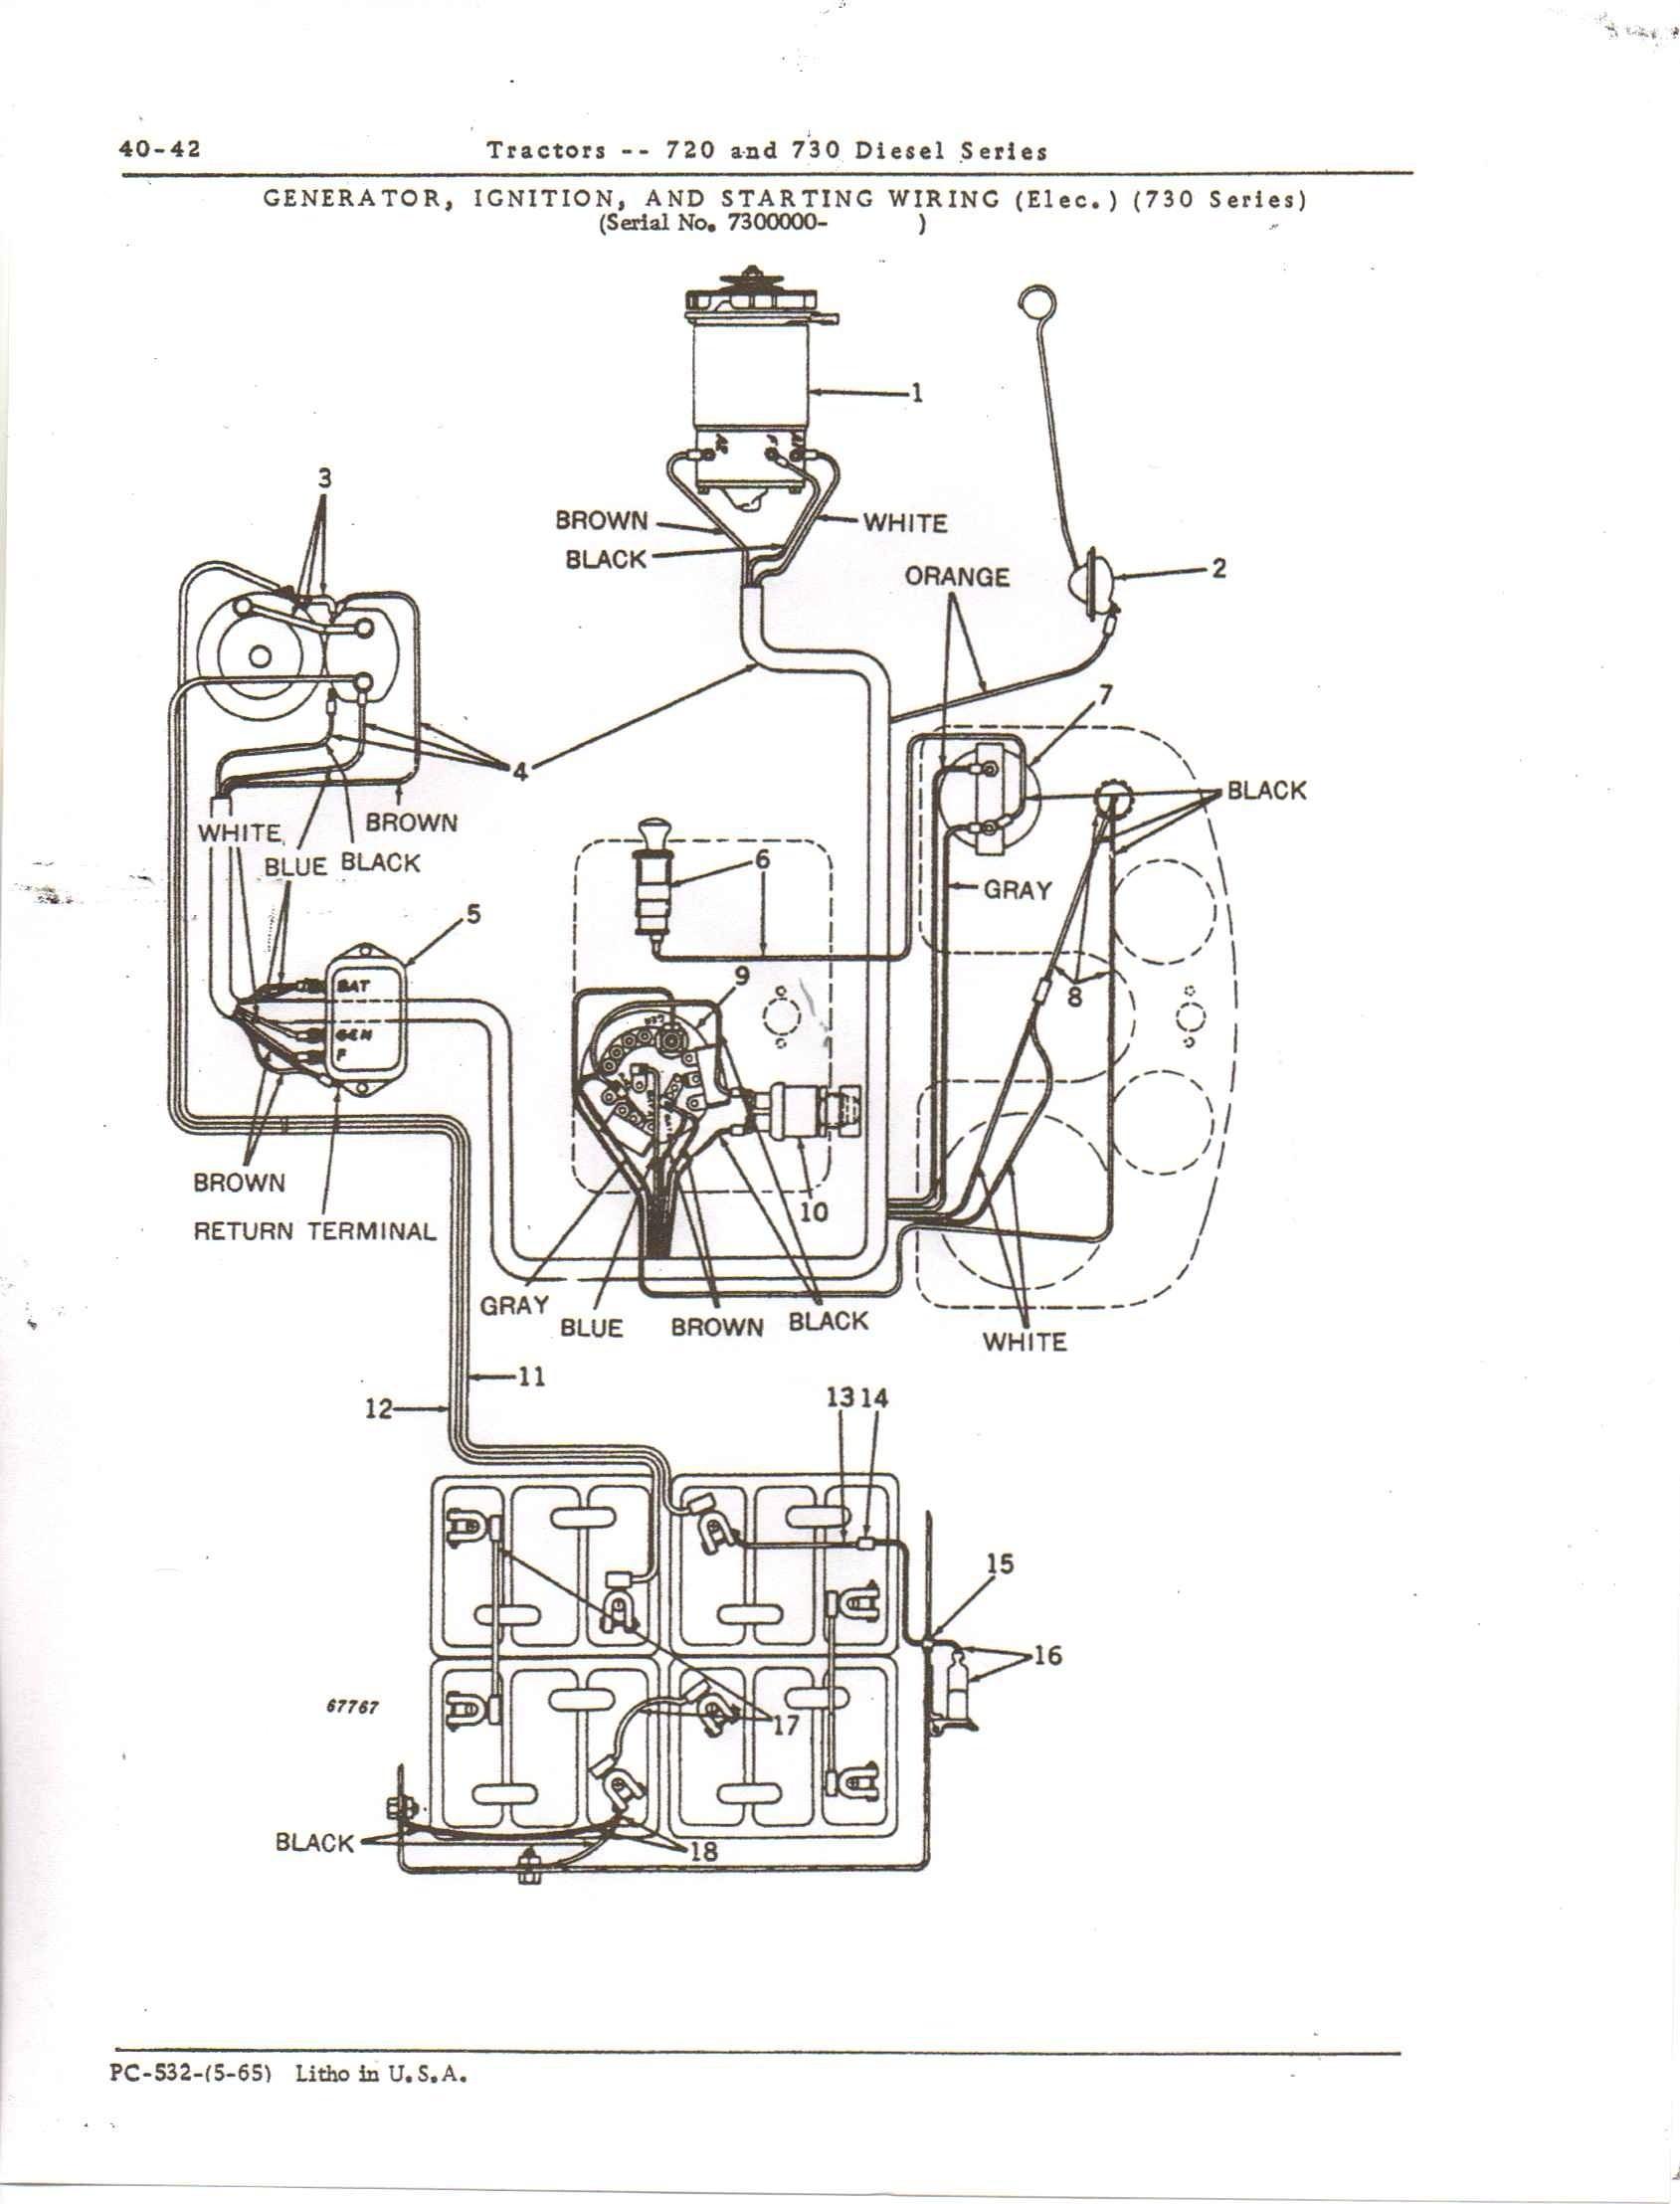 John Deere 345 Lawn Tractor Wiring Diagram Diagram] 116 John Deere Lawn Tractor Wiring Diagram Full Of John Deere 345 Lawn Tractor Wiring Diagram